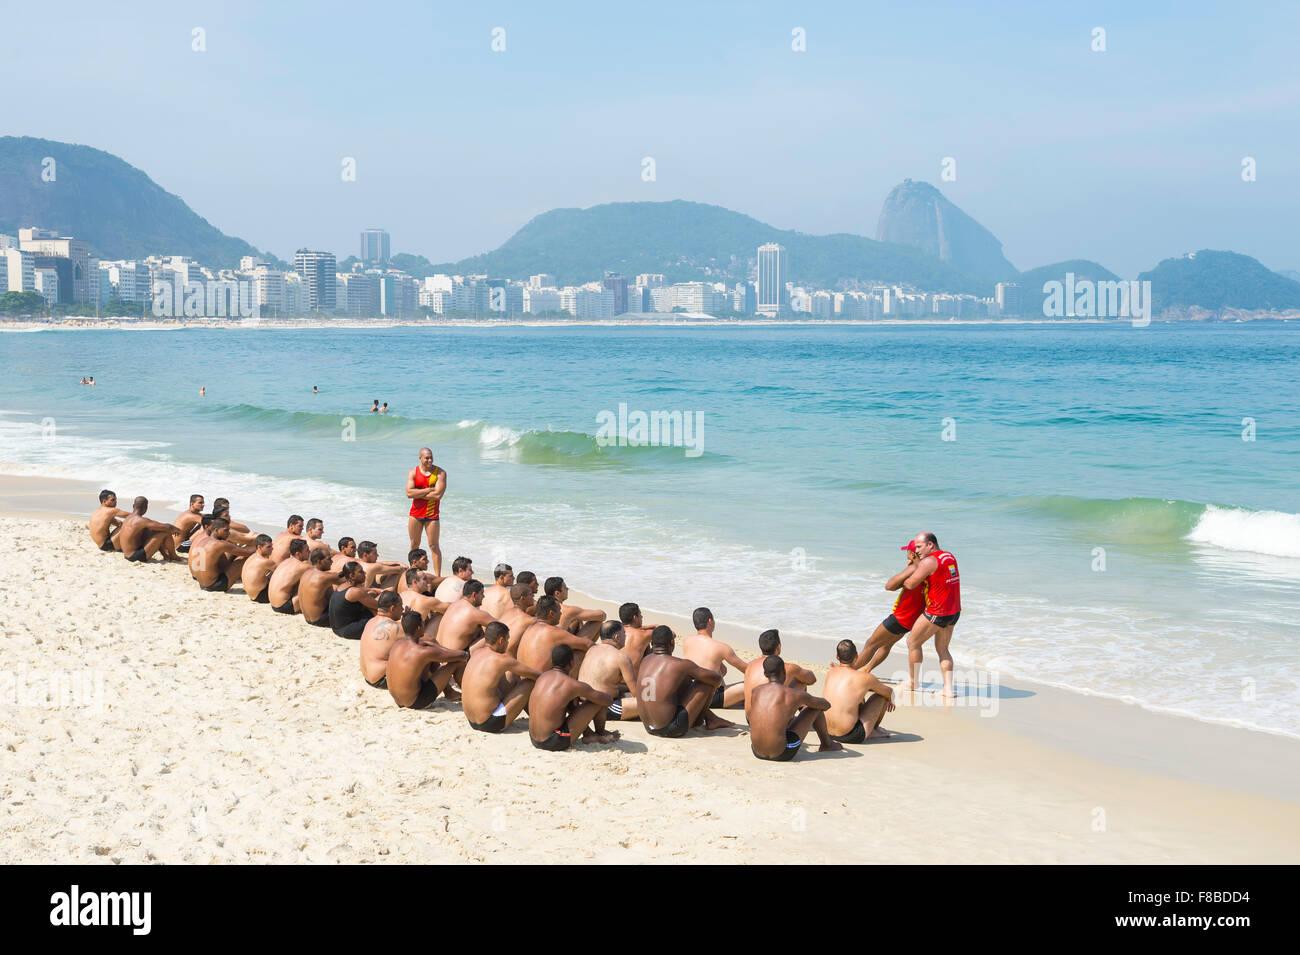 RIO DE JANEIRO, BRAZIL - NOVEMBER 10, 2015: Instructors lead a training course on Copacabana Beach. - Stock Image